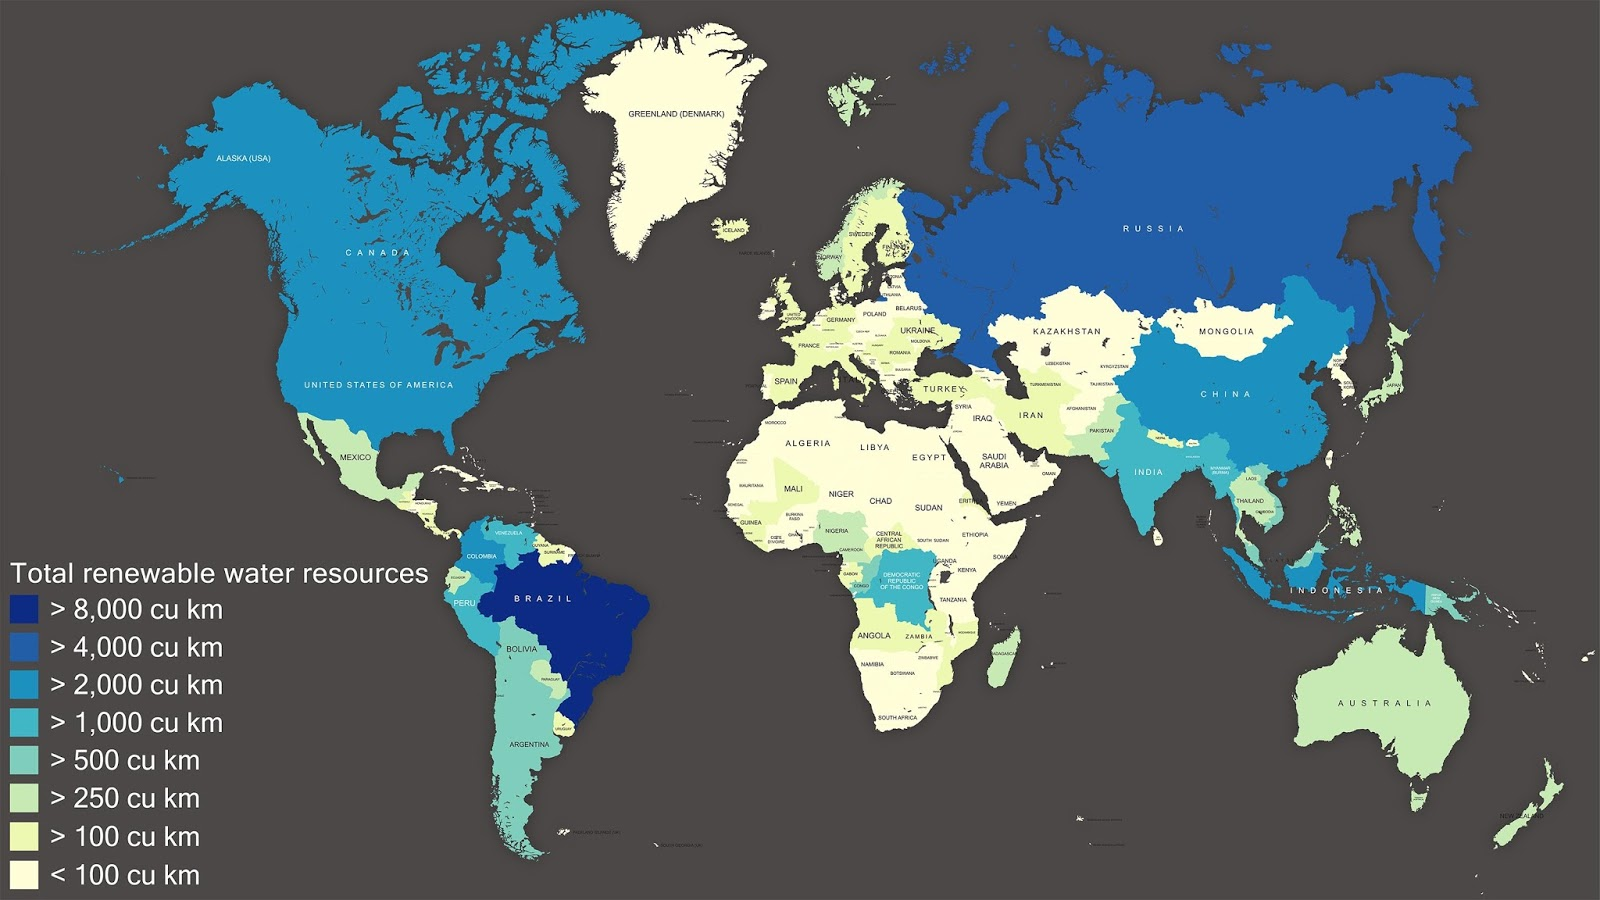 Total renewable water resources